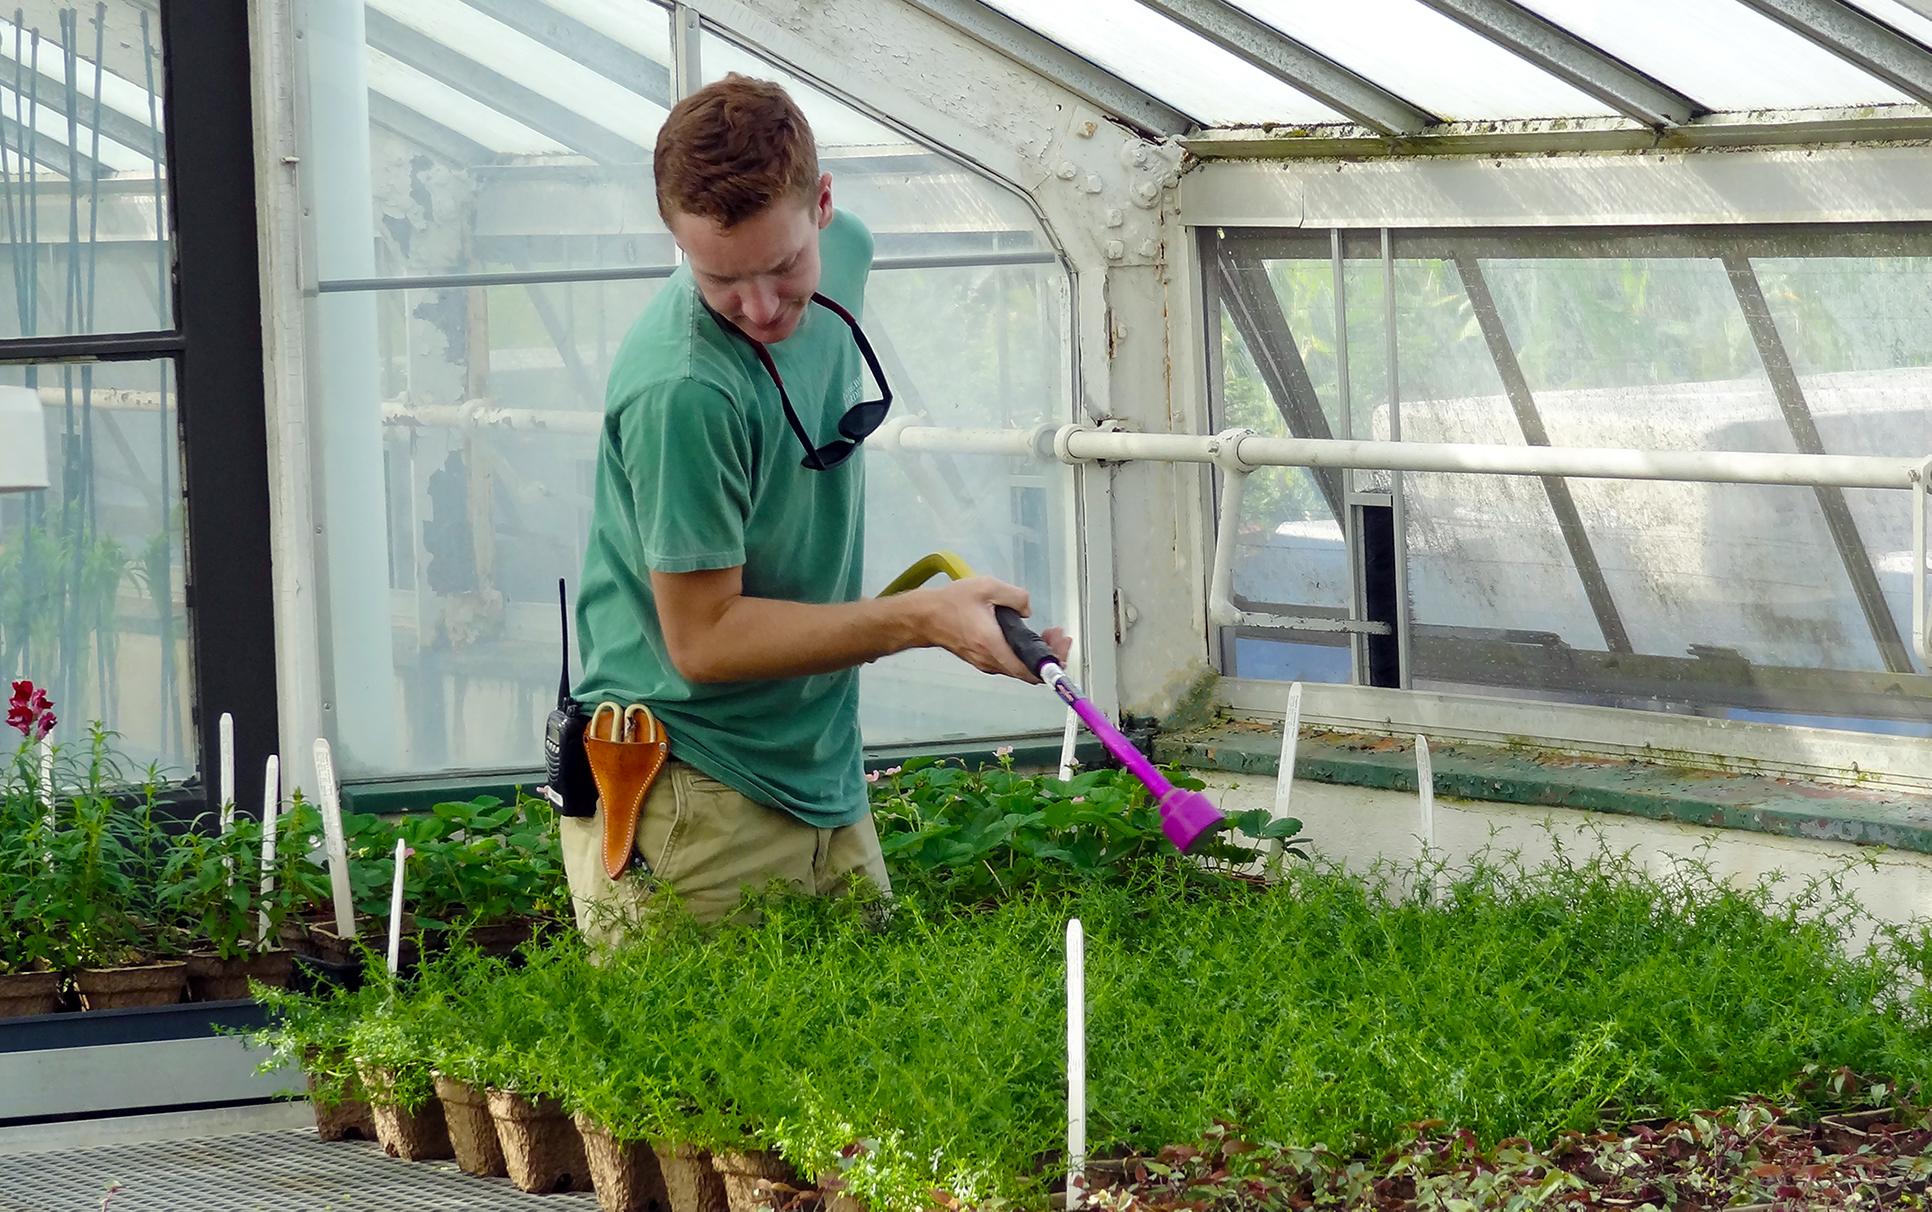 GardenCenterWorkerMain.jpg